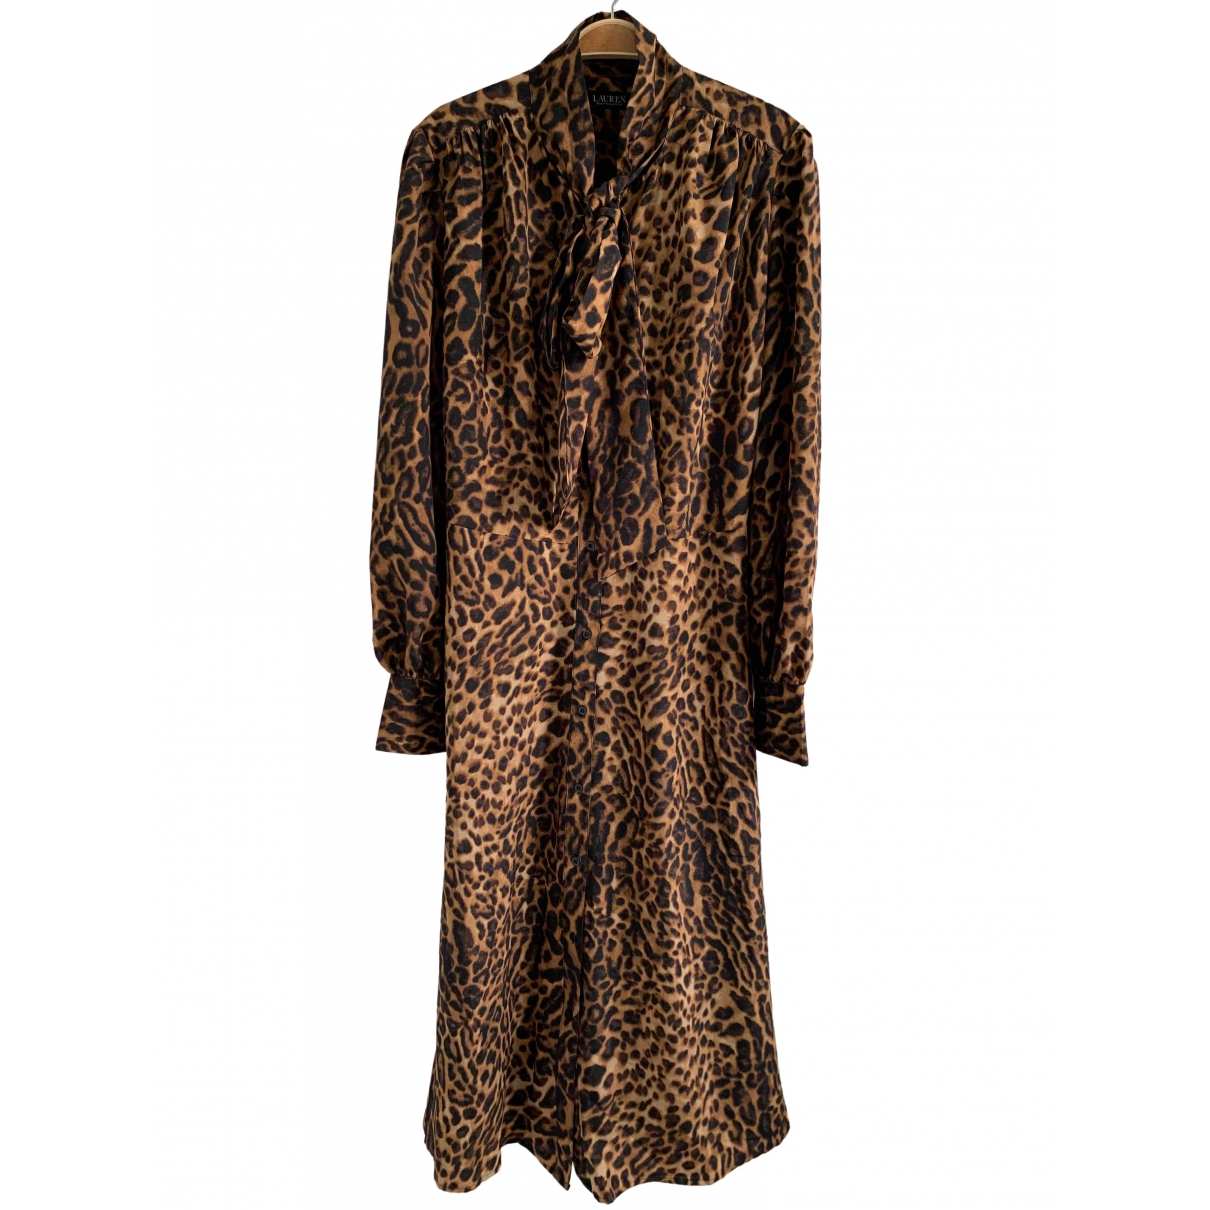 Lauren Ralph Lauren \N Kleid in  Braun Polyester